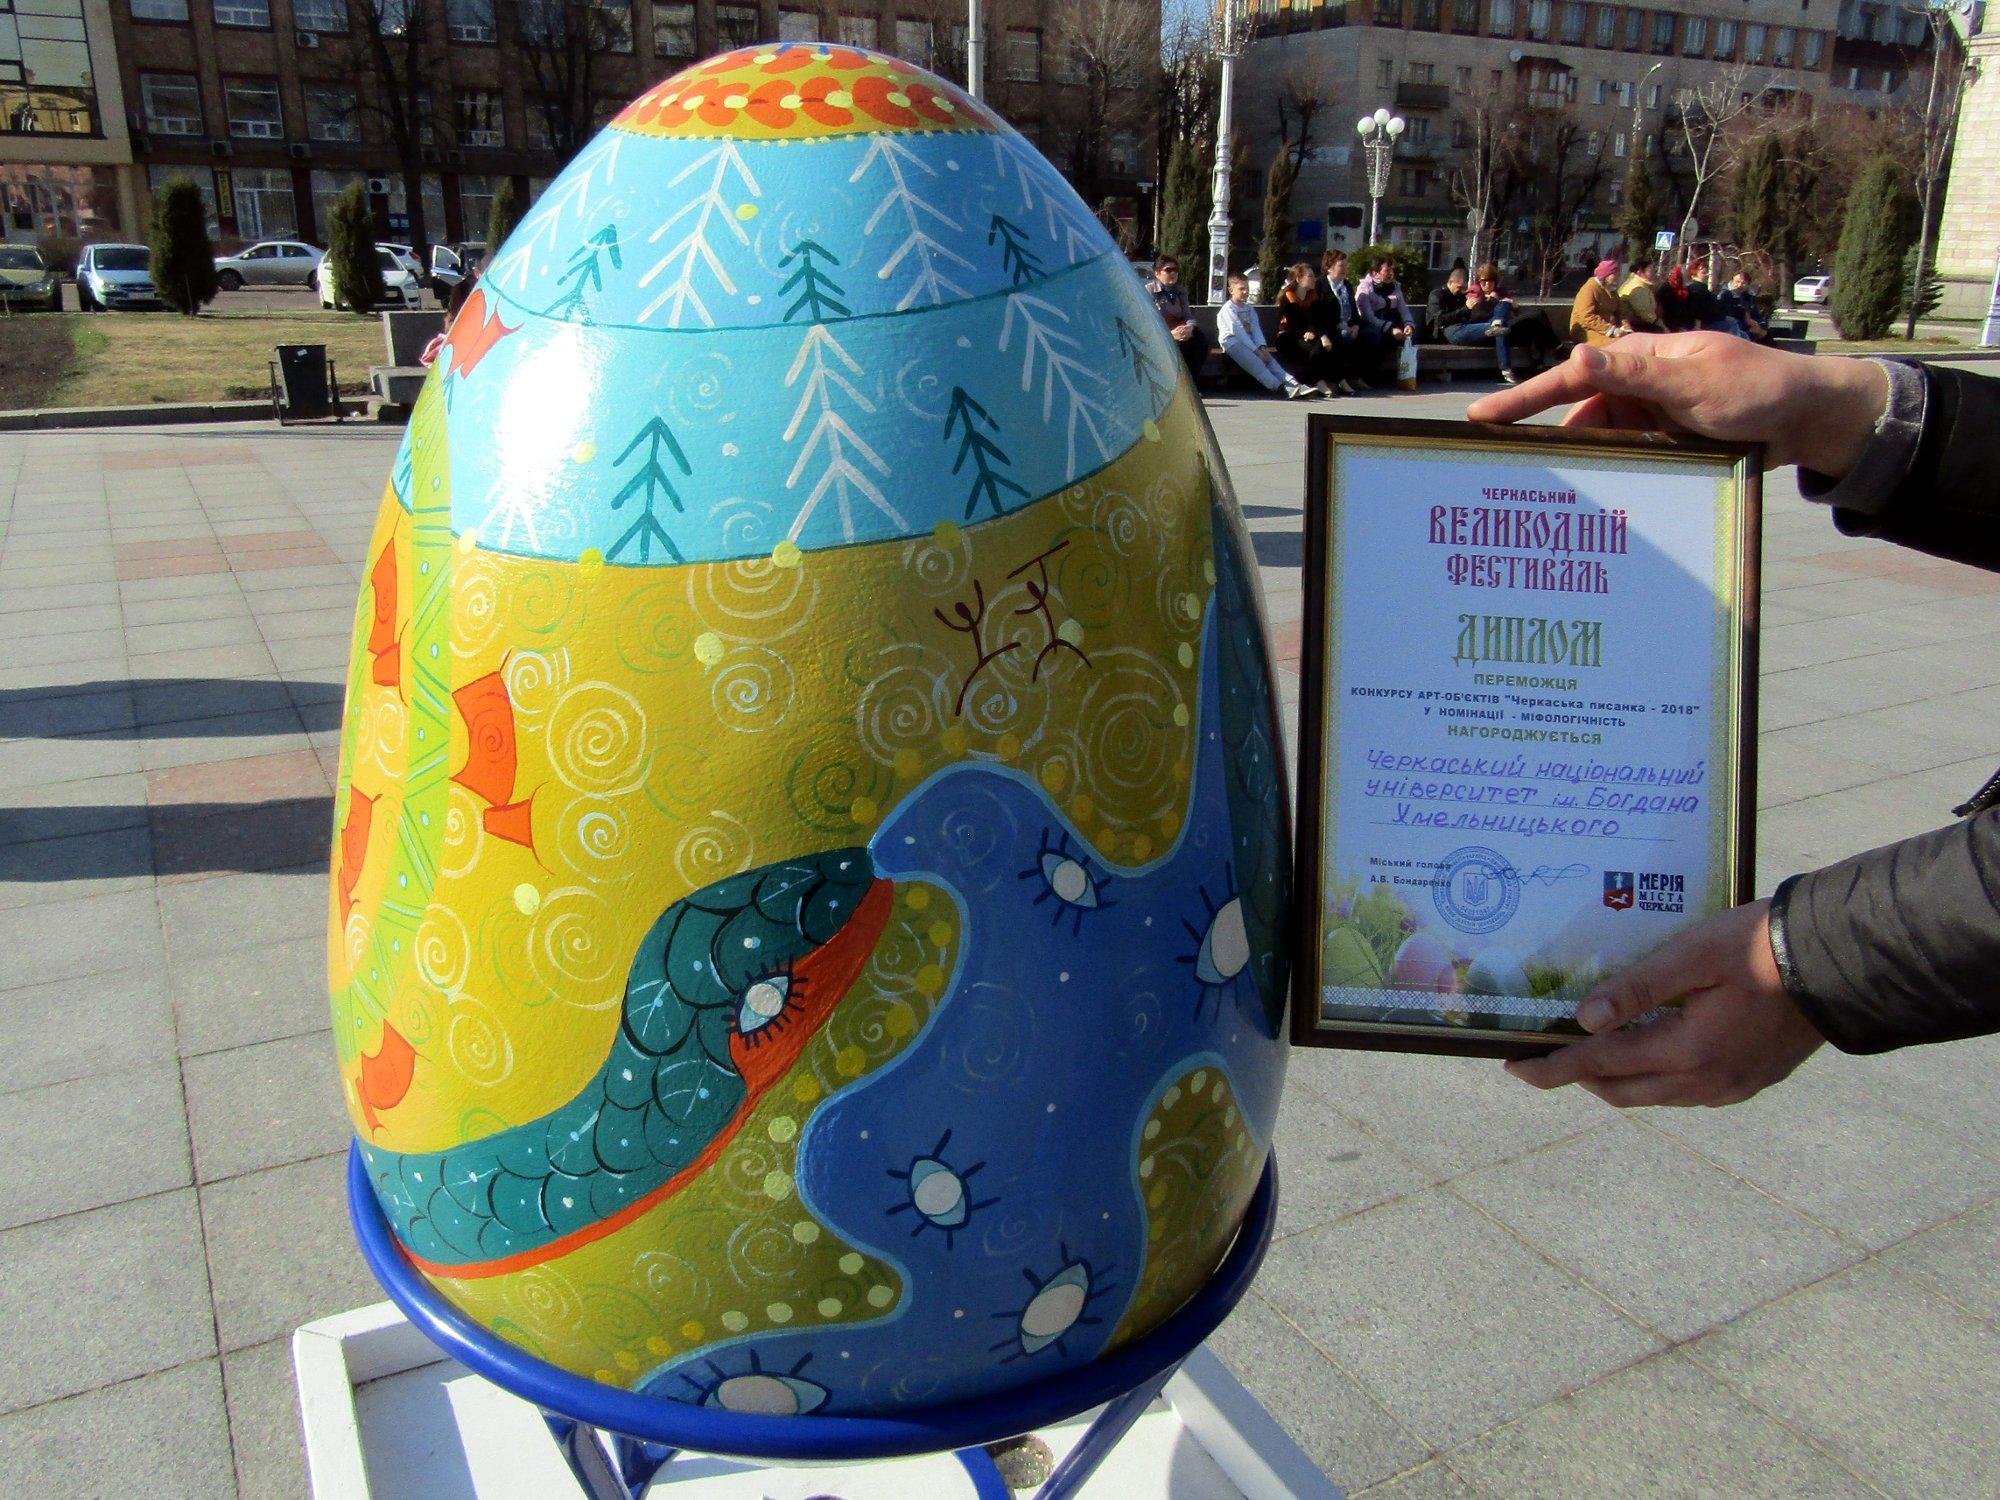 Черкаська писанка — «Яйце-Райце» Олени Пилипенко